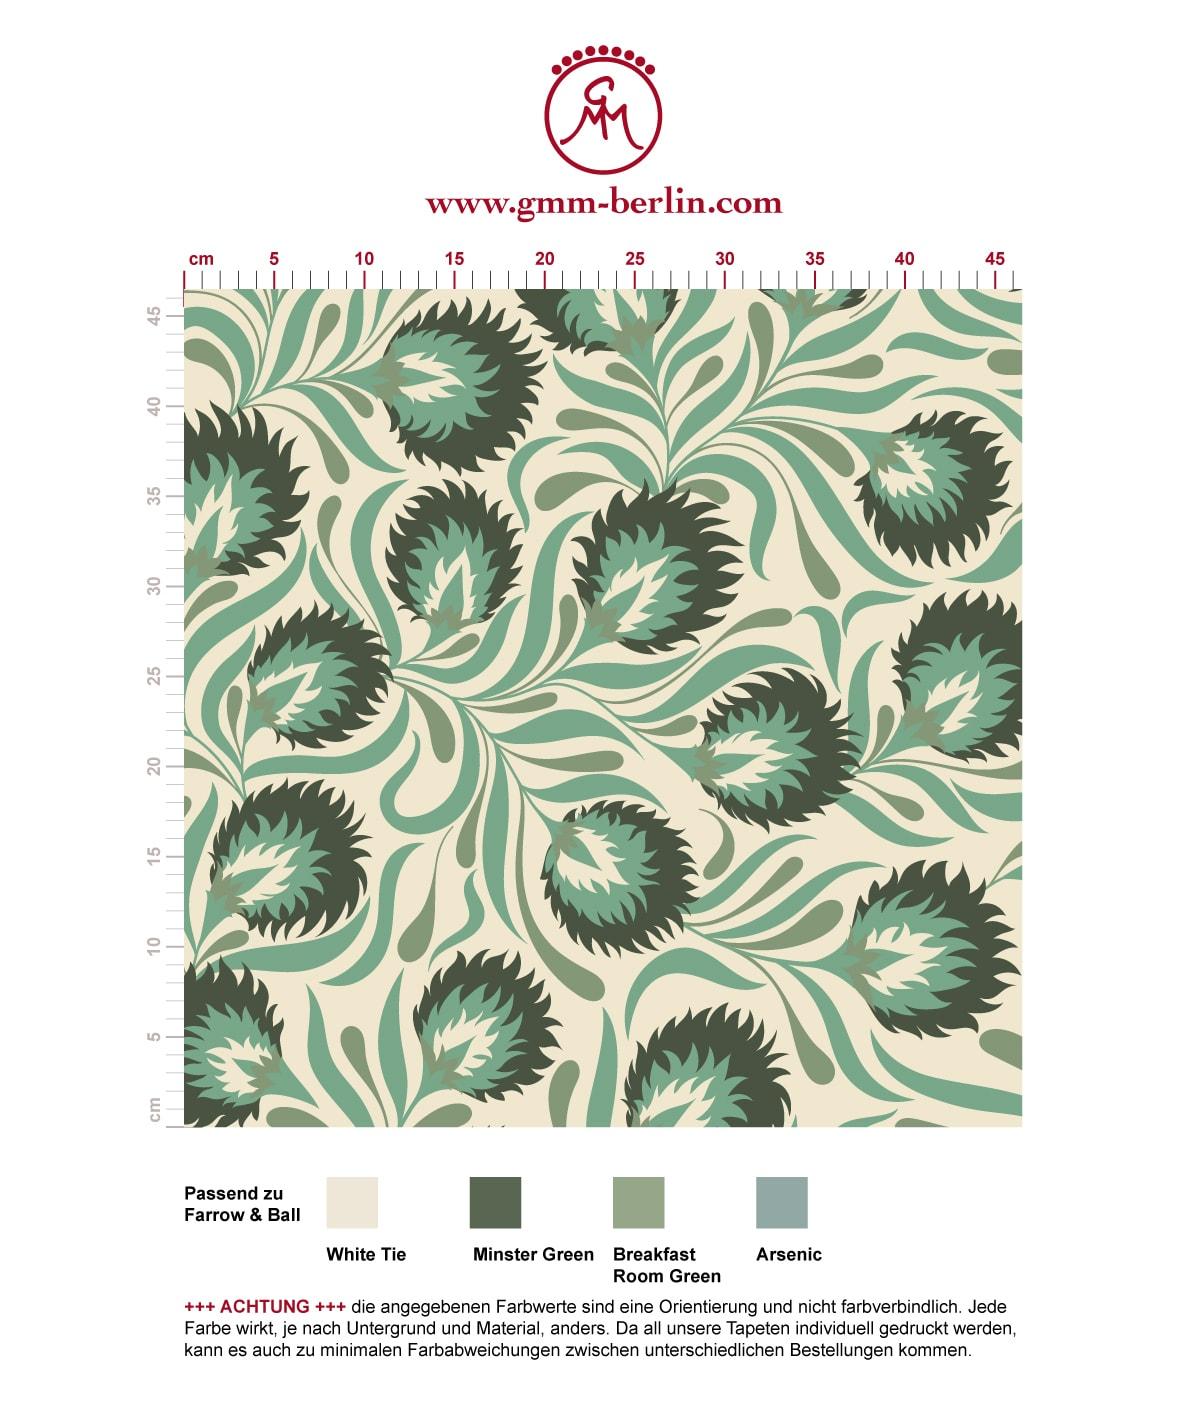 Feine Jugendstil Tapete mit großen Blüten in grün angepasst an Farrow & Ball Wandfarben. Aus dem GMM-BERLIN.com Sortiment: Schöne Tapeten in der Farbe: grün